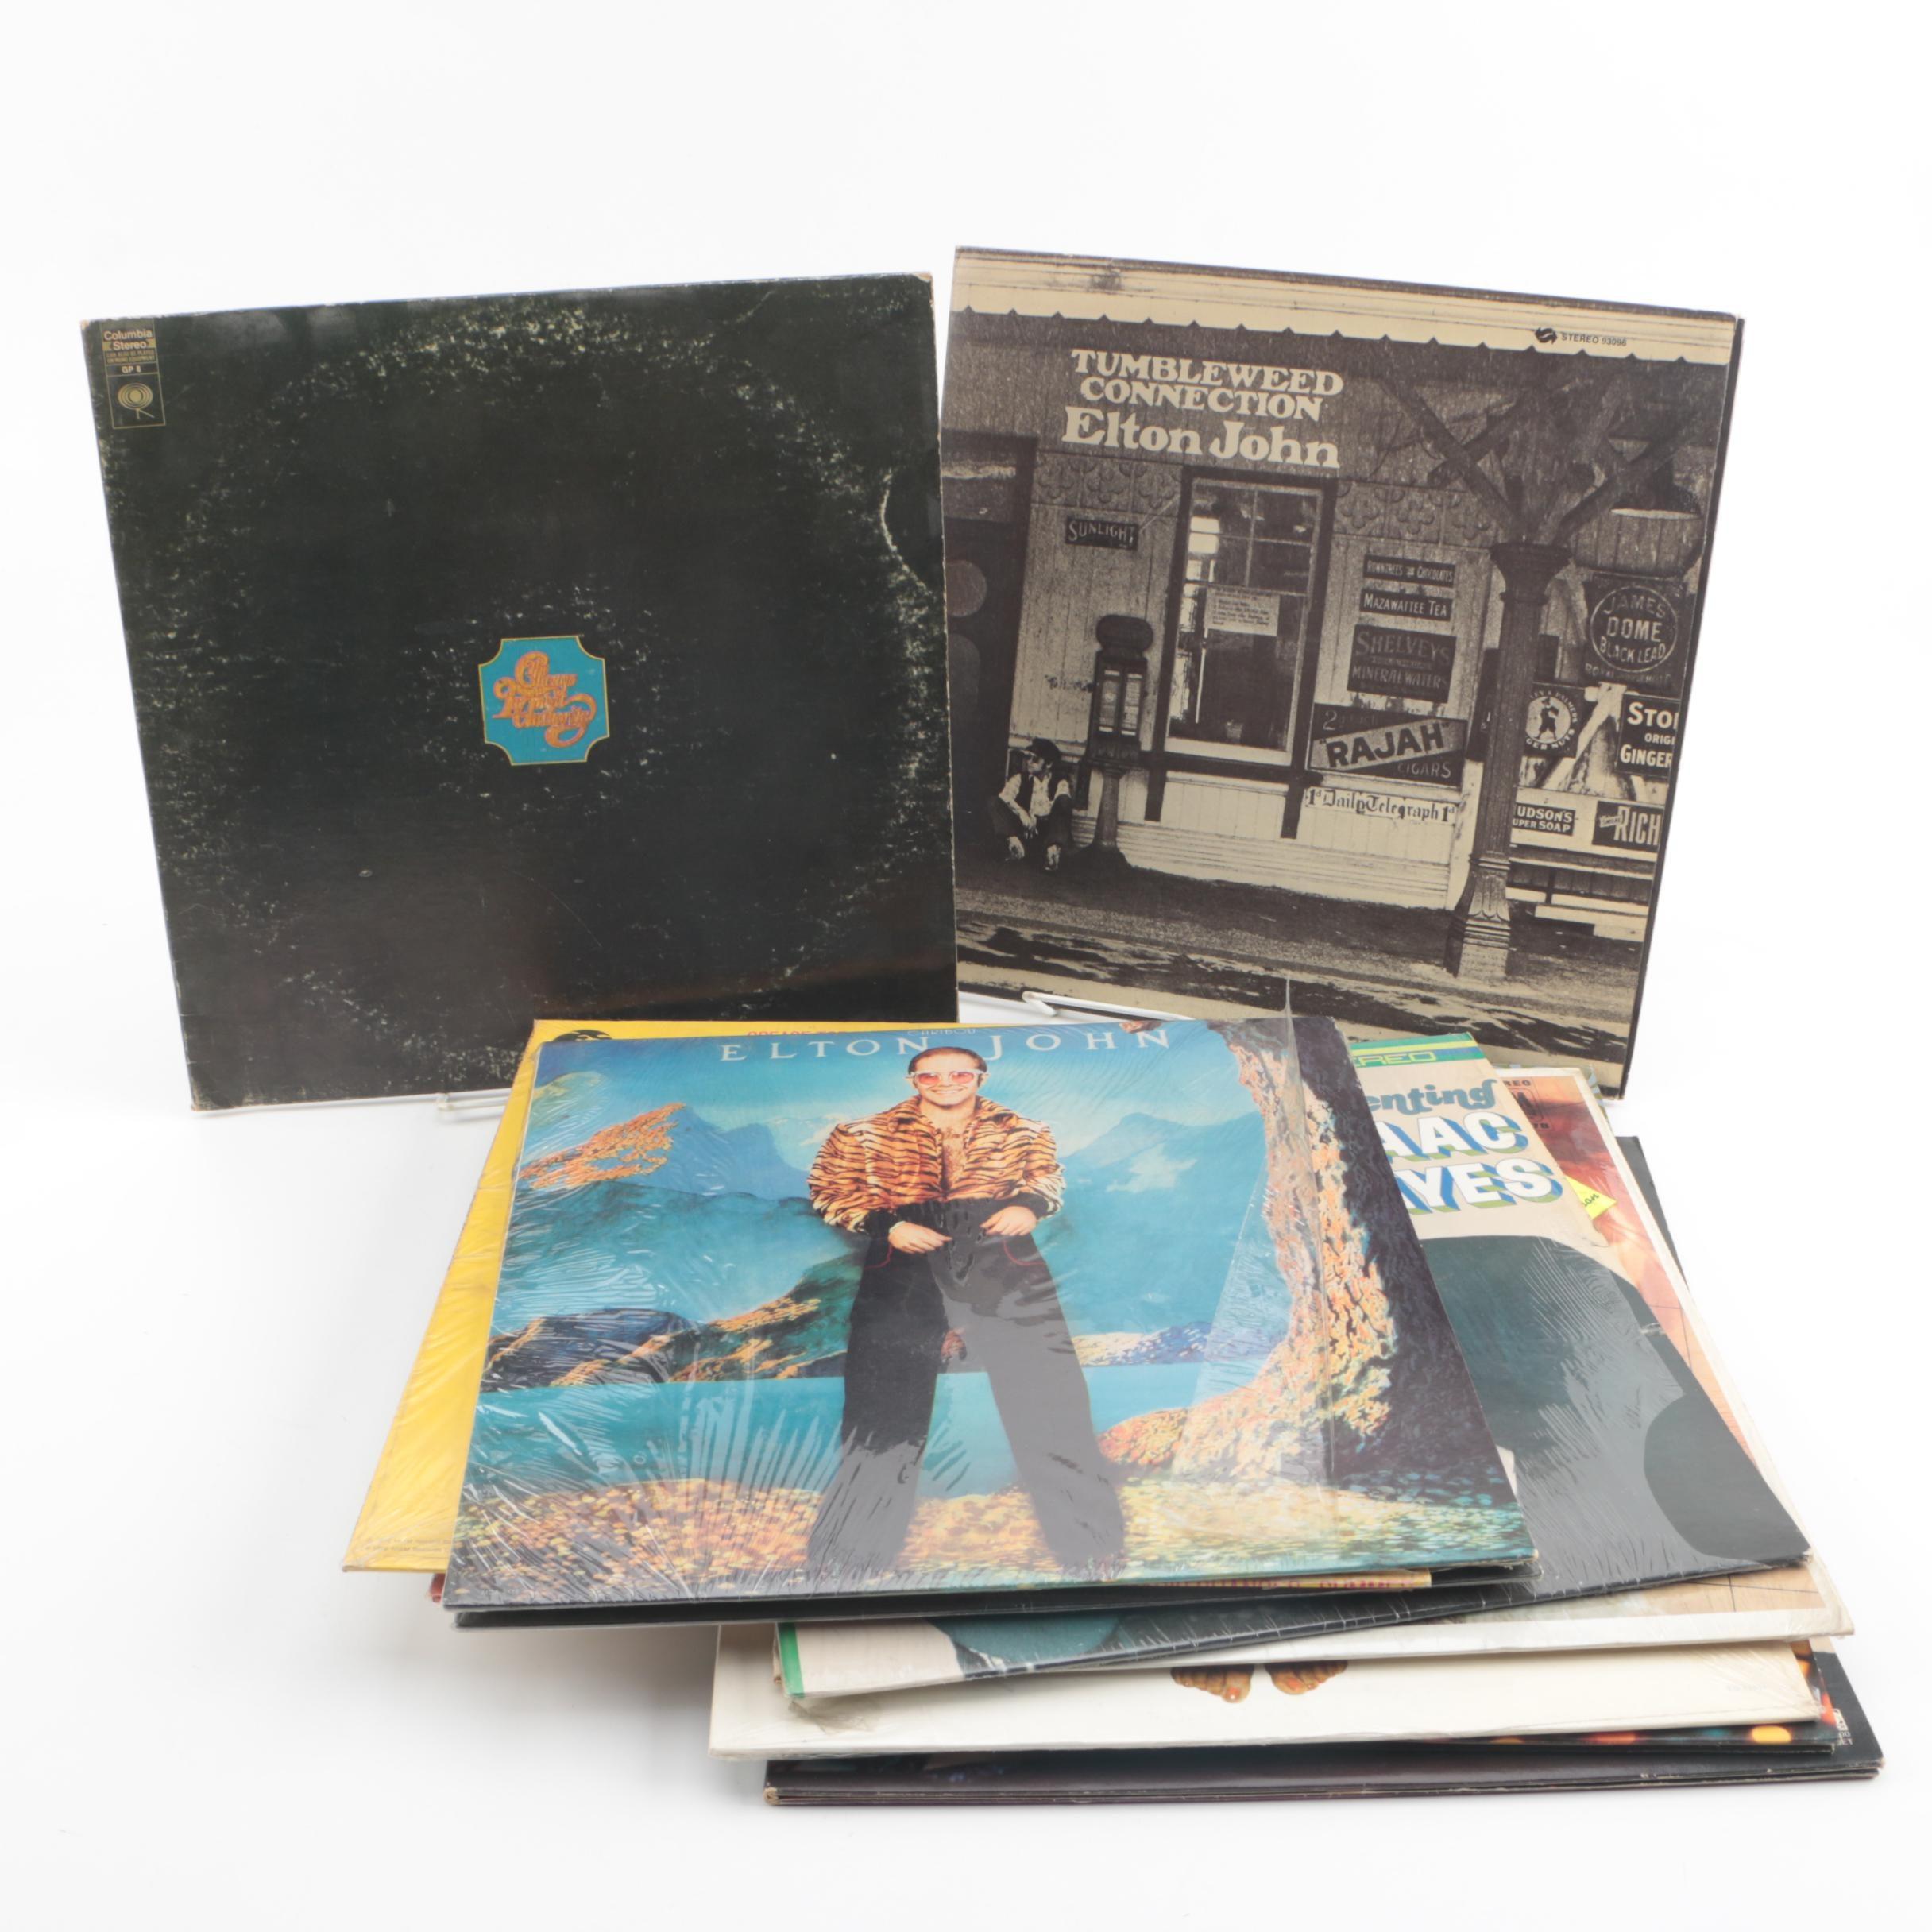 1970s Pop Records including Elton John, Bette Midler, and Chicago